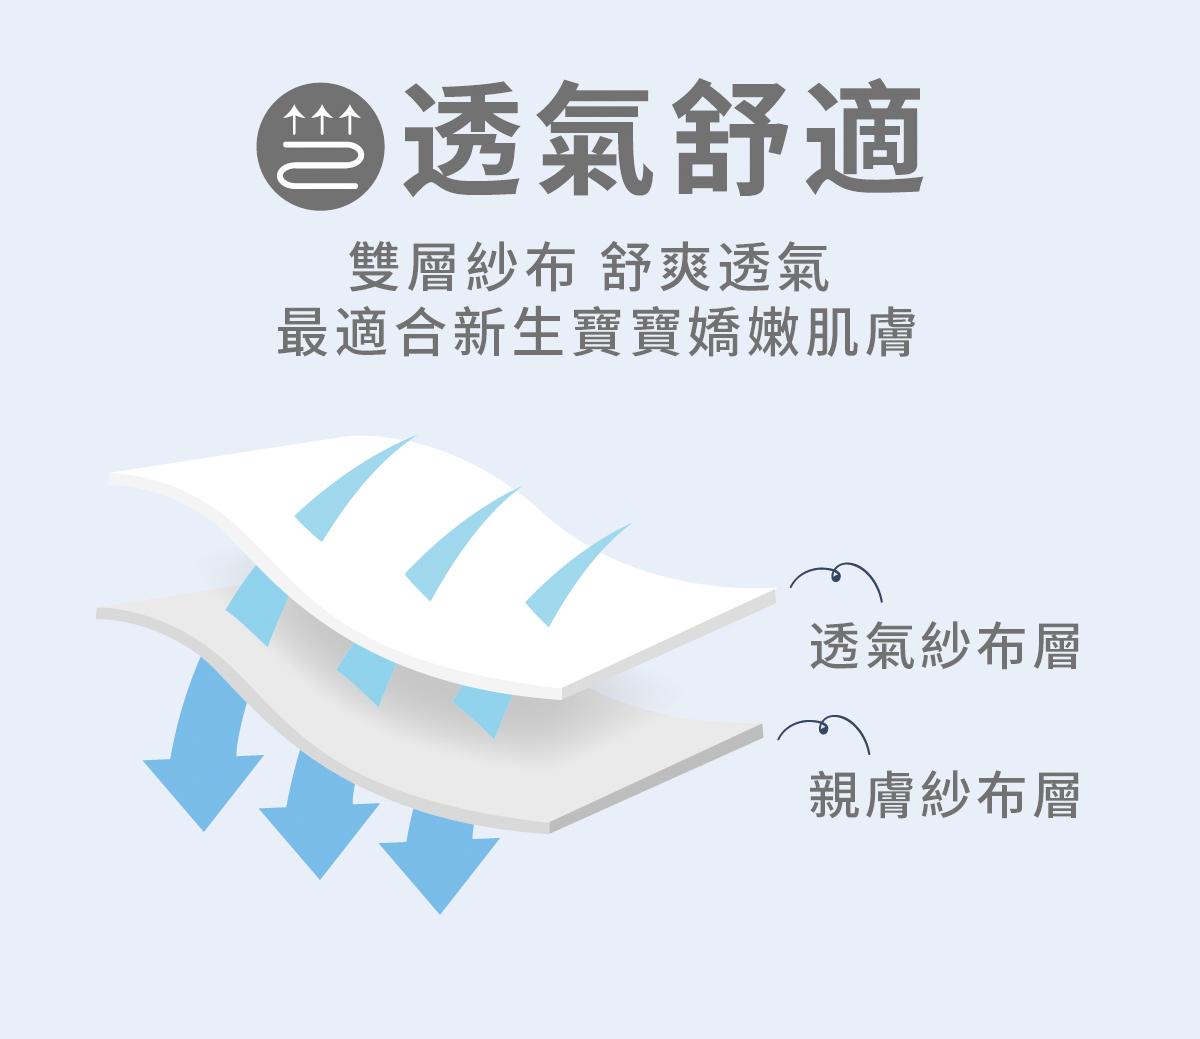 proimages/Cottons&BabyClothing/BabyClothesSeries/GauzeBathTowel/2394/2394-成長印記紗布大浴巾EDM-9.jpg